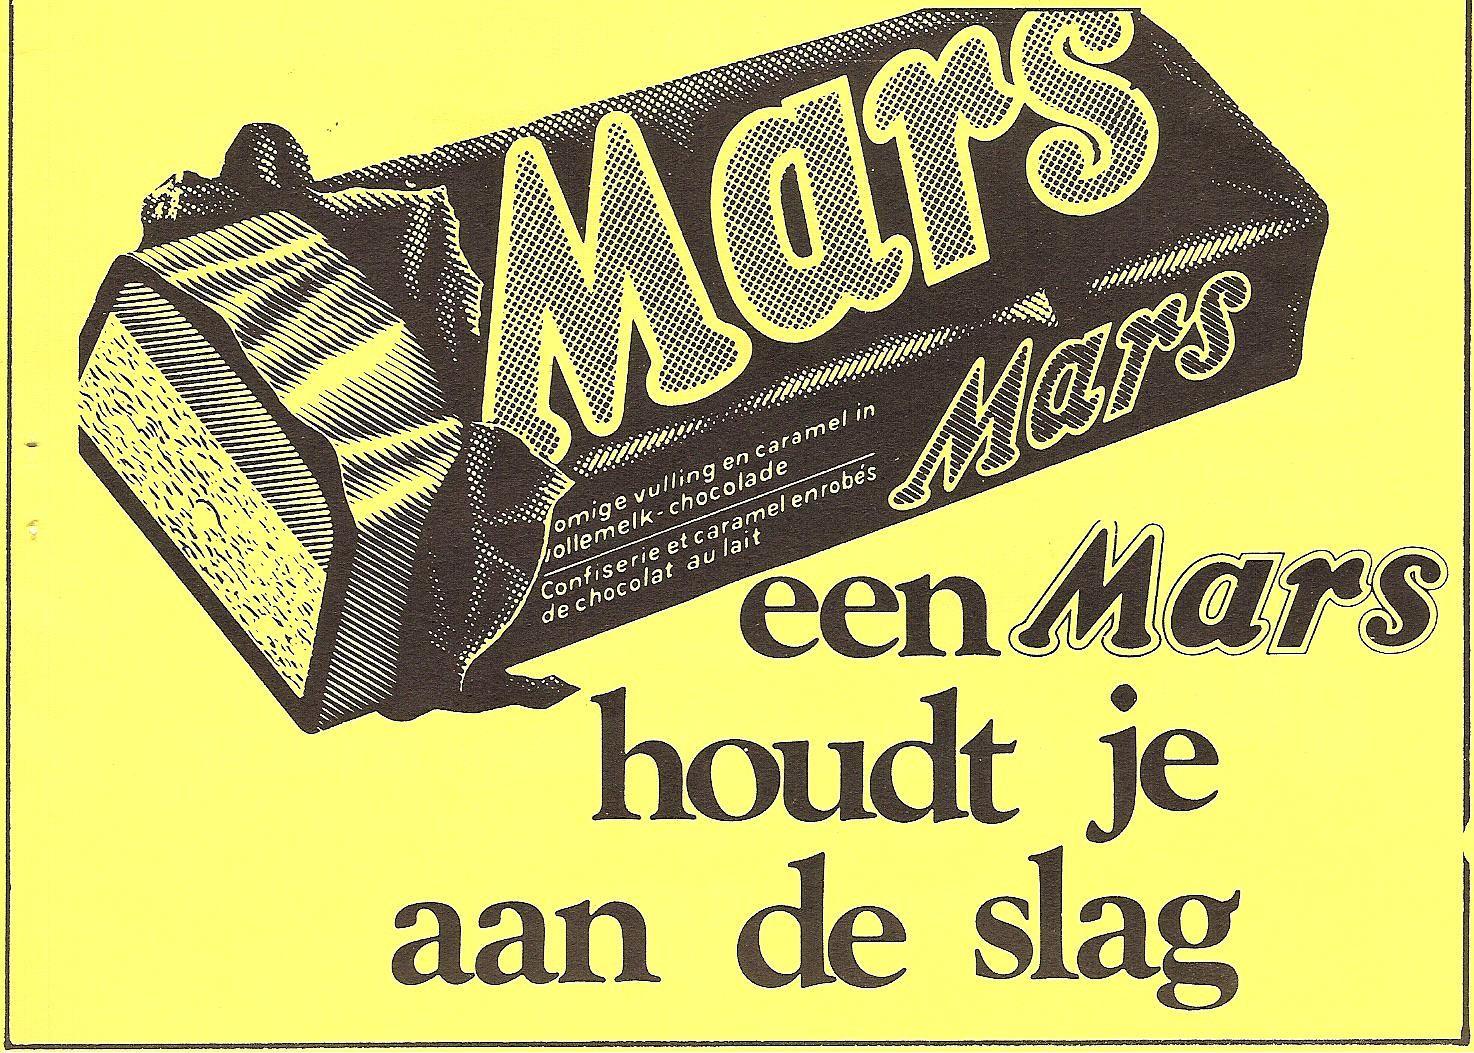 Mars reclame 1984